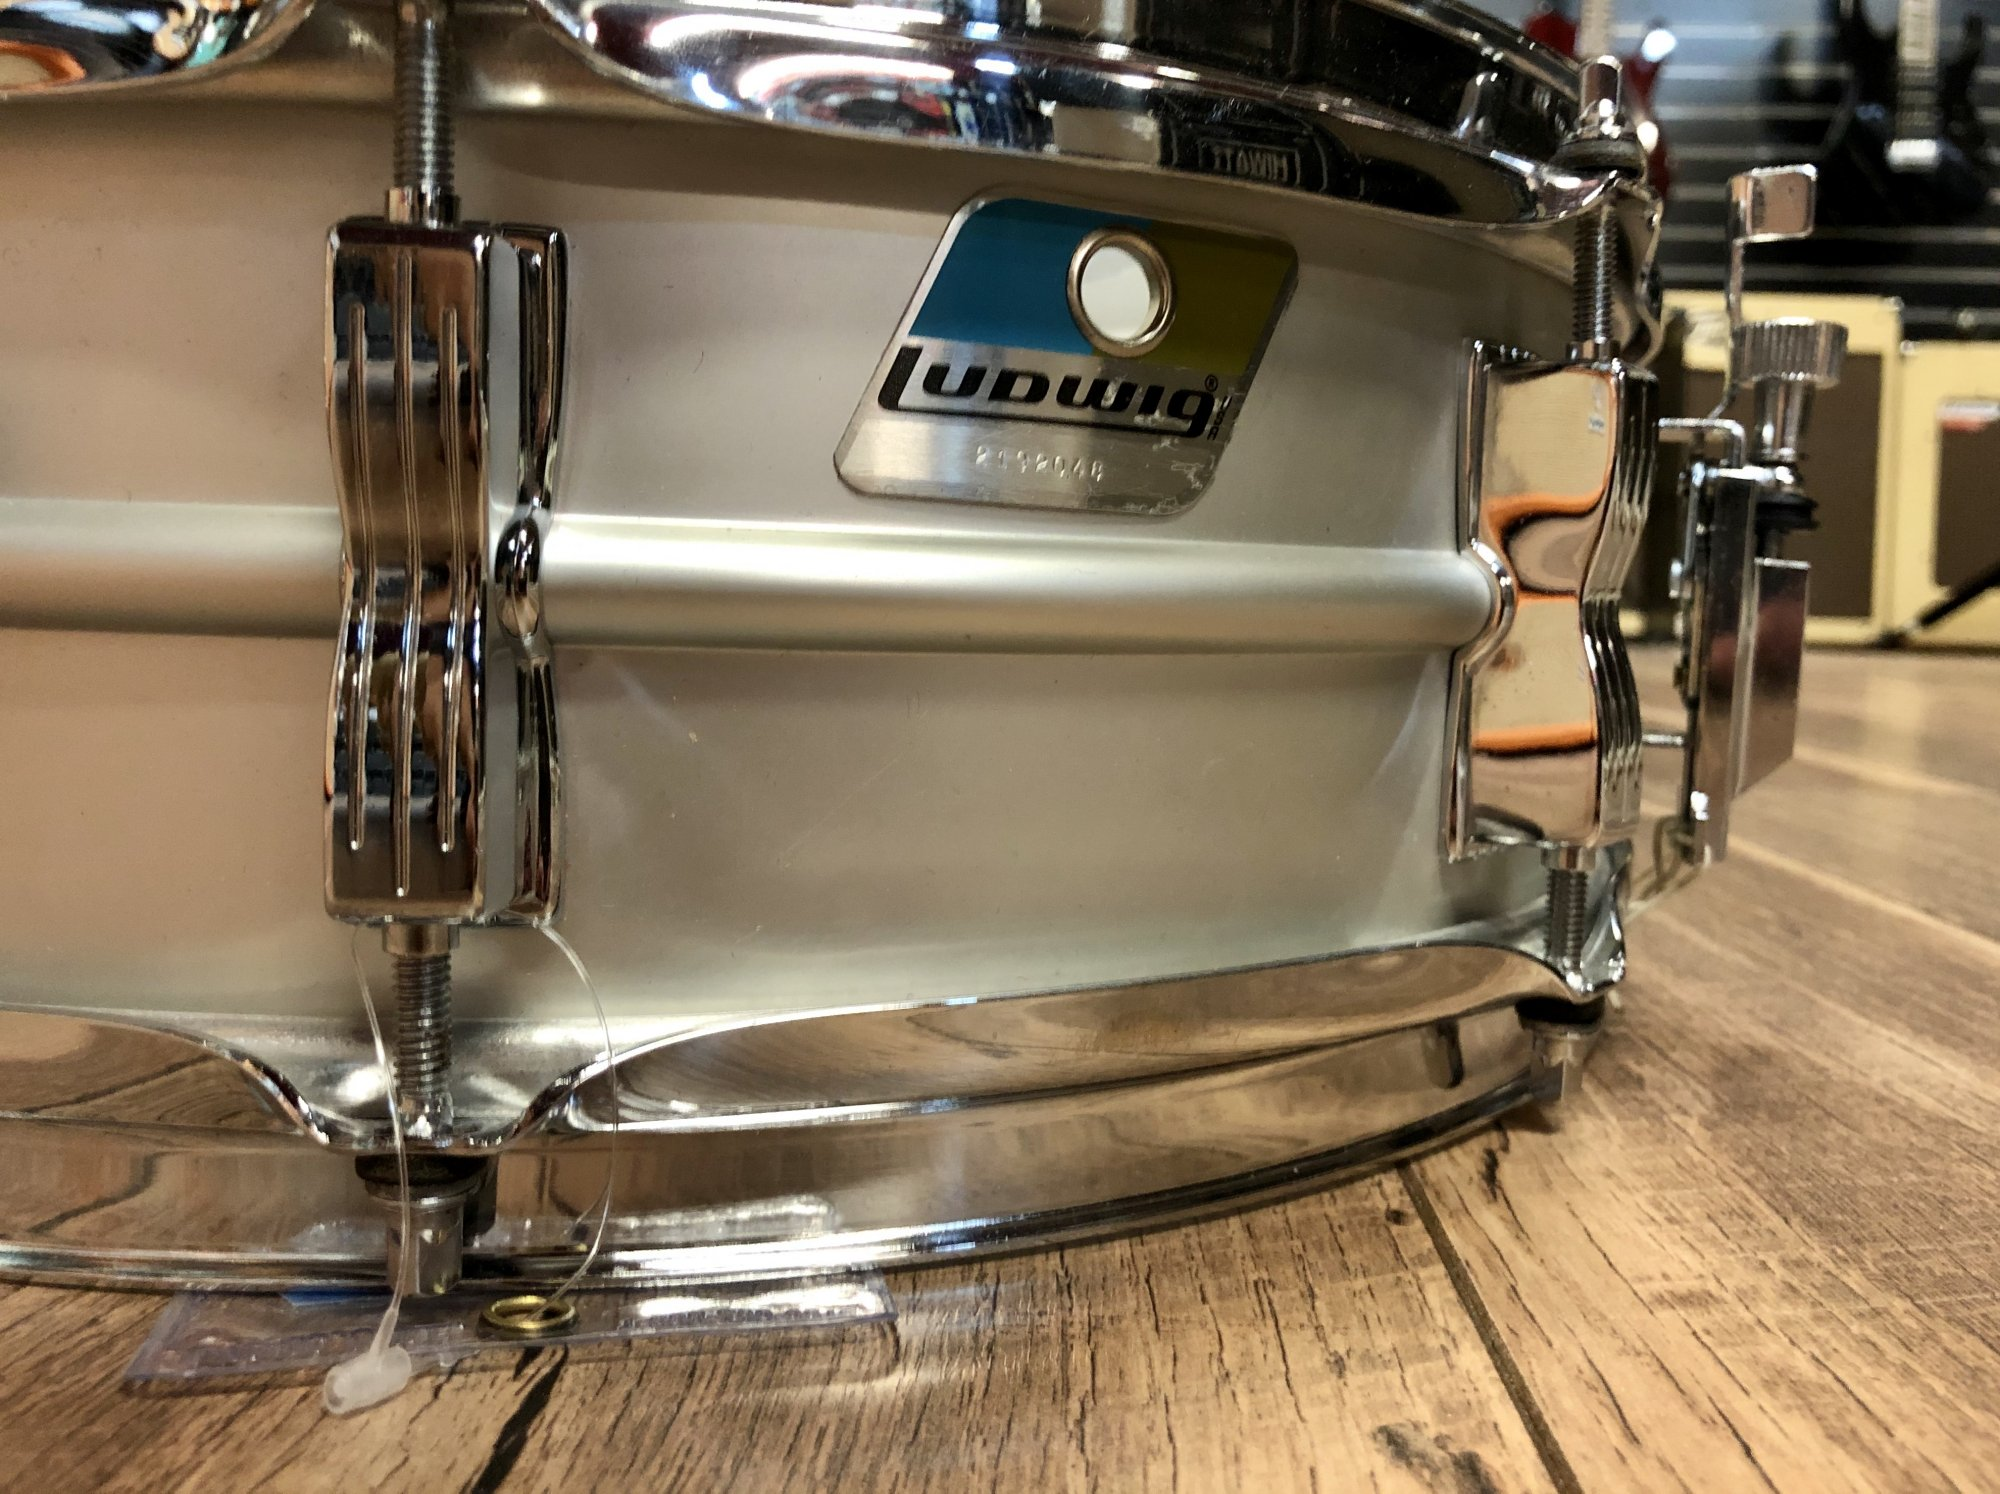 USED - Ludwig LM404C Acrolite Snare Drum